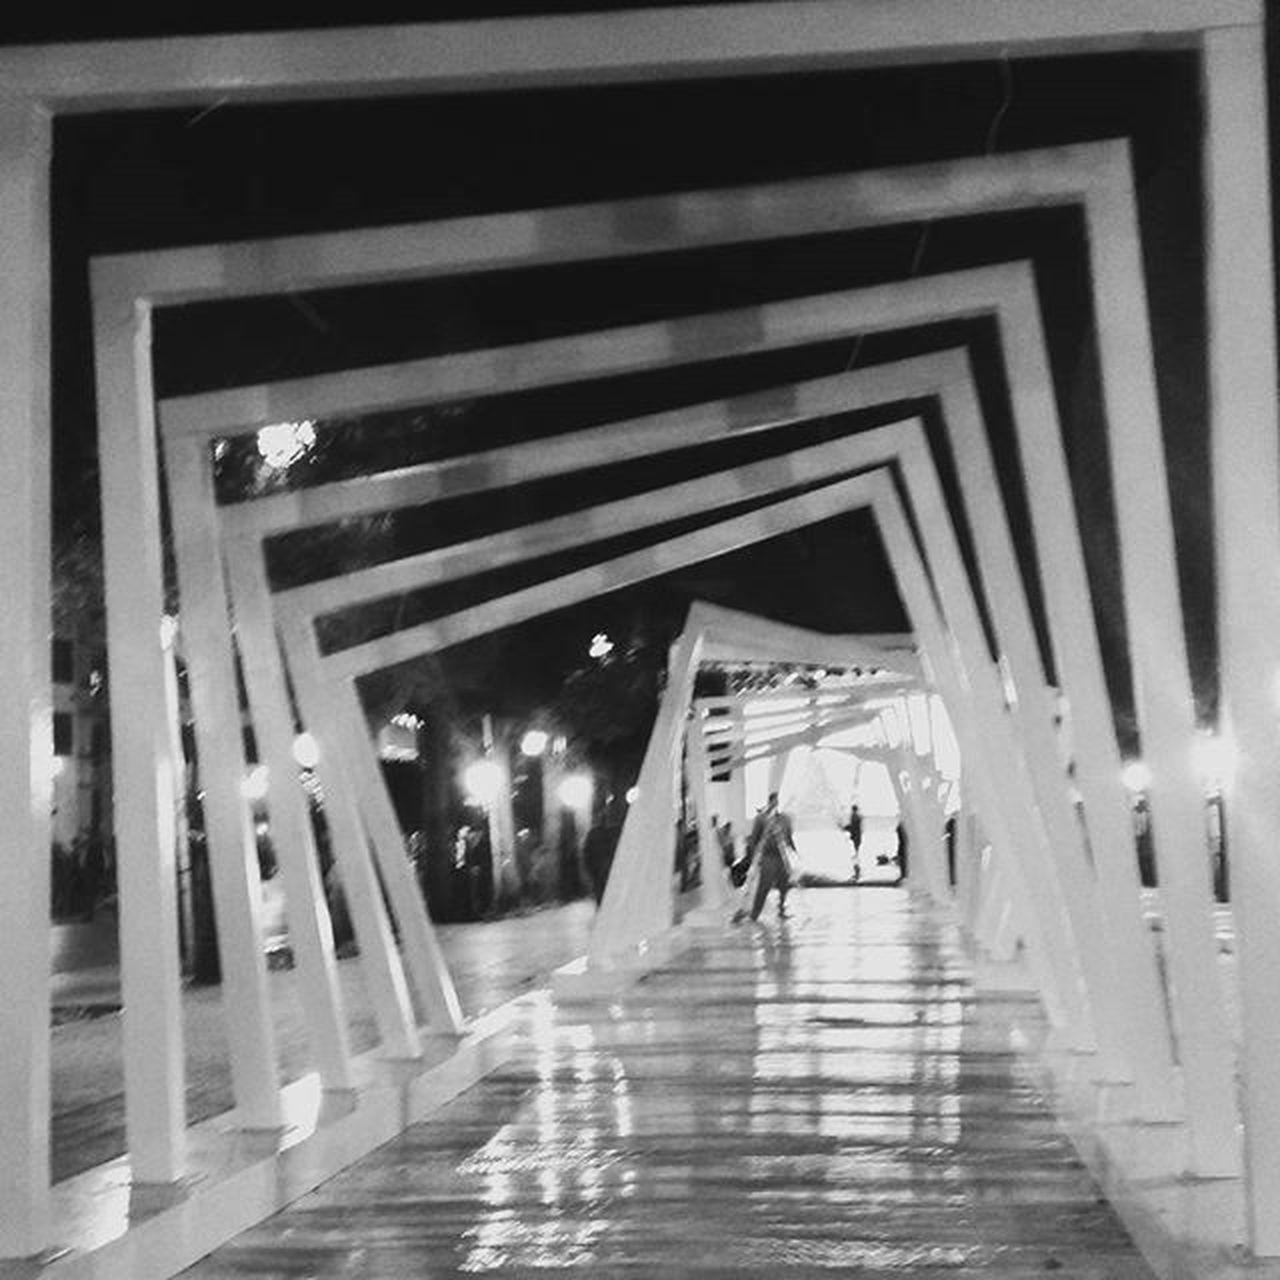 Jcc2015 Cinema Tunisia Decoration التحضيرات على قدم و ساق :)